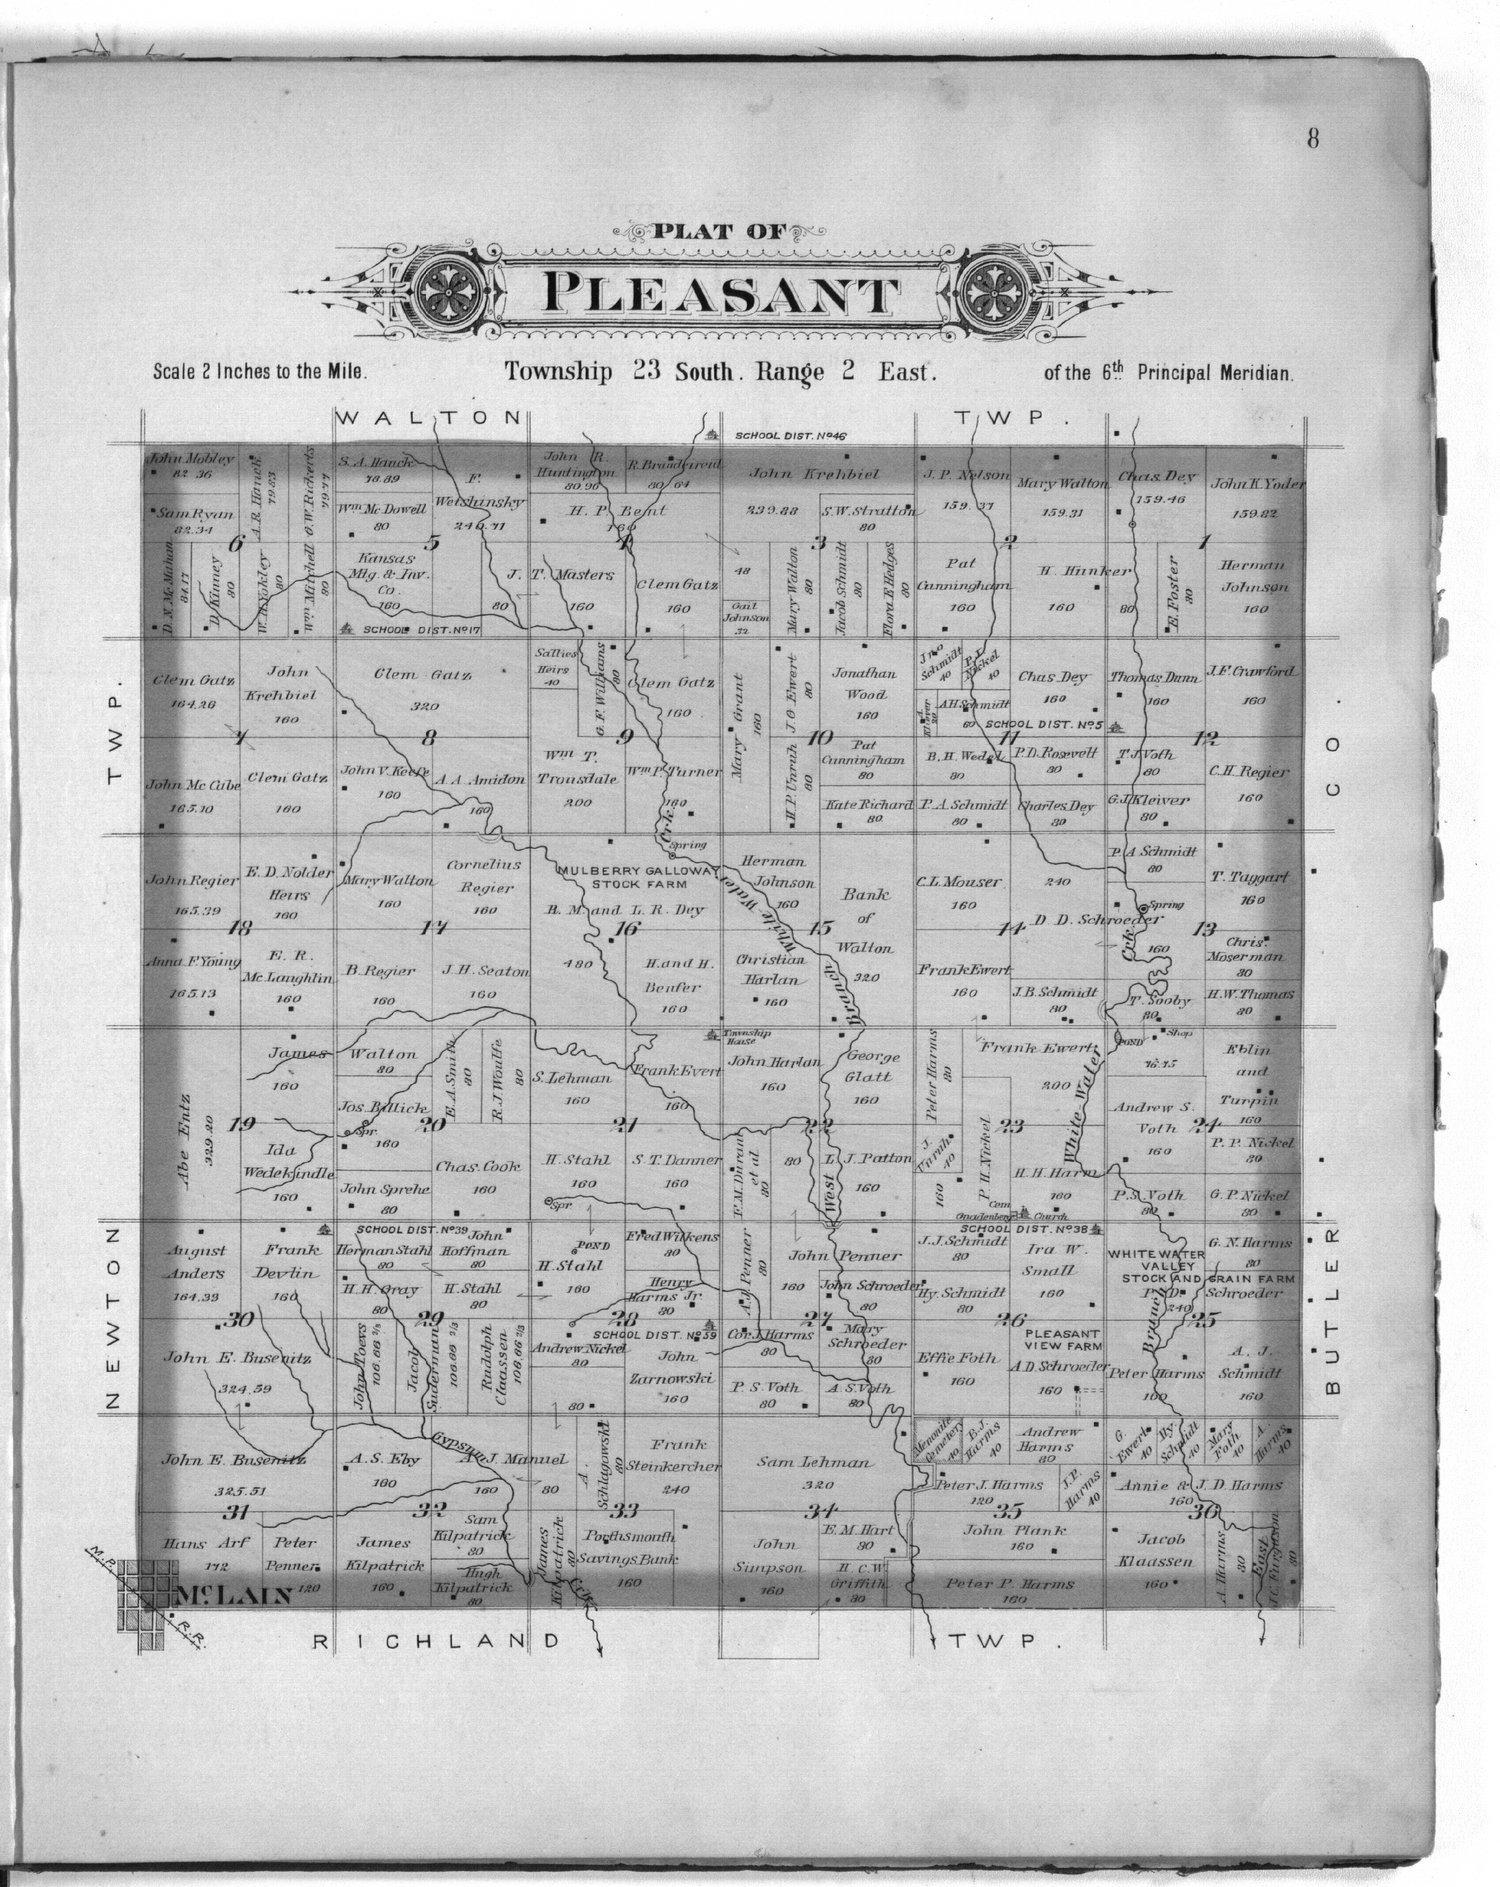 Plat book of Harvey County, Kansas - 8